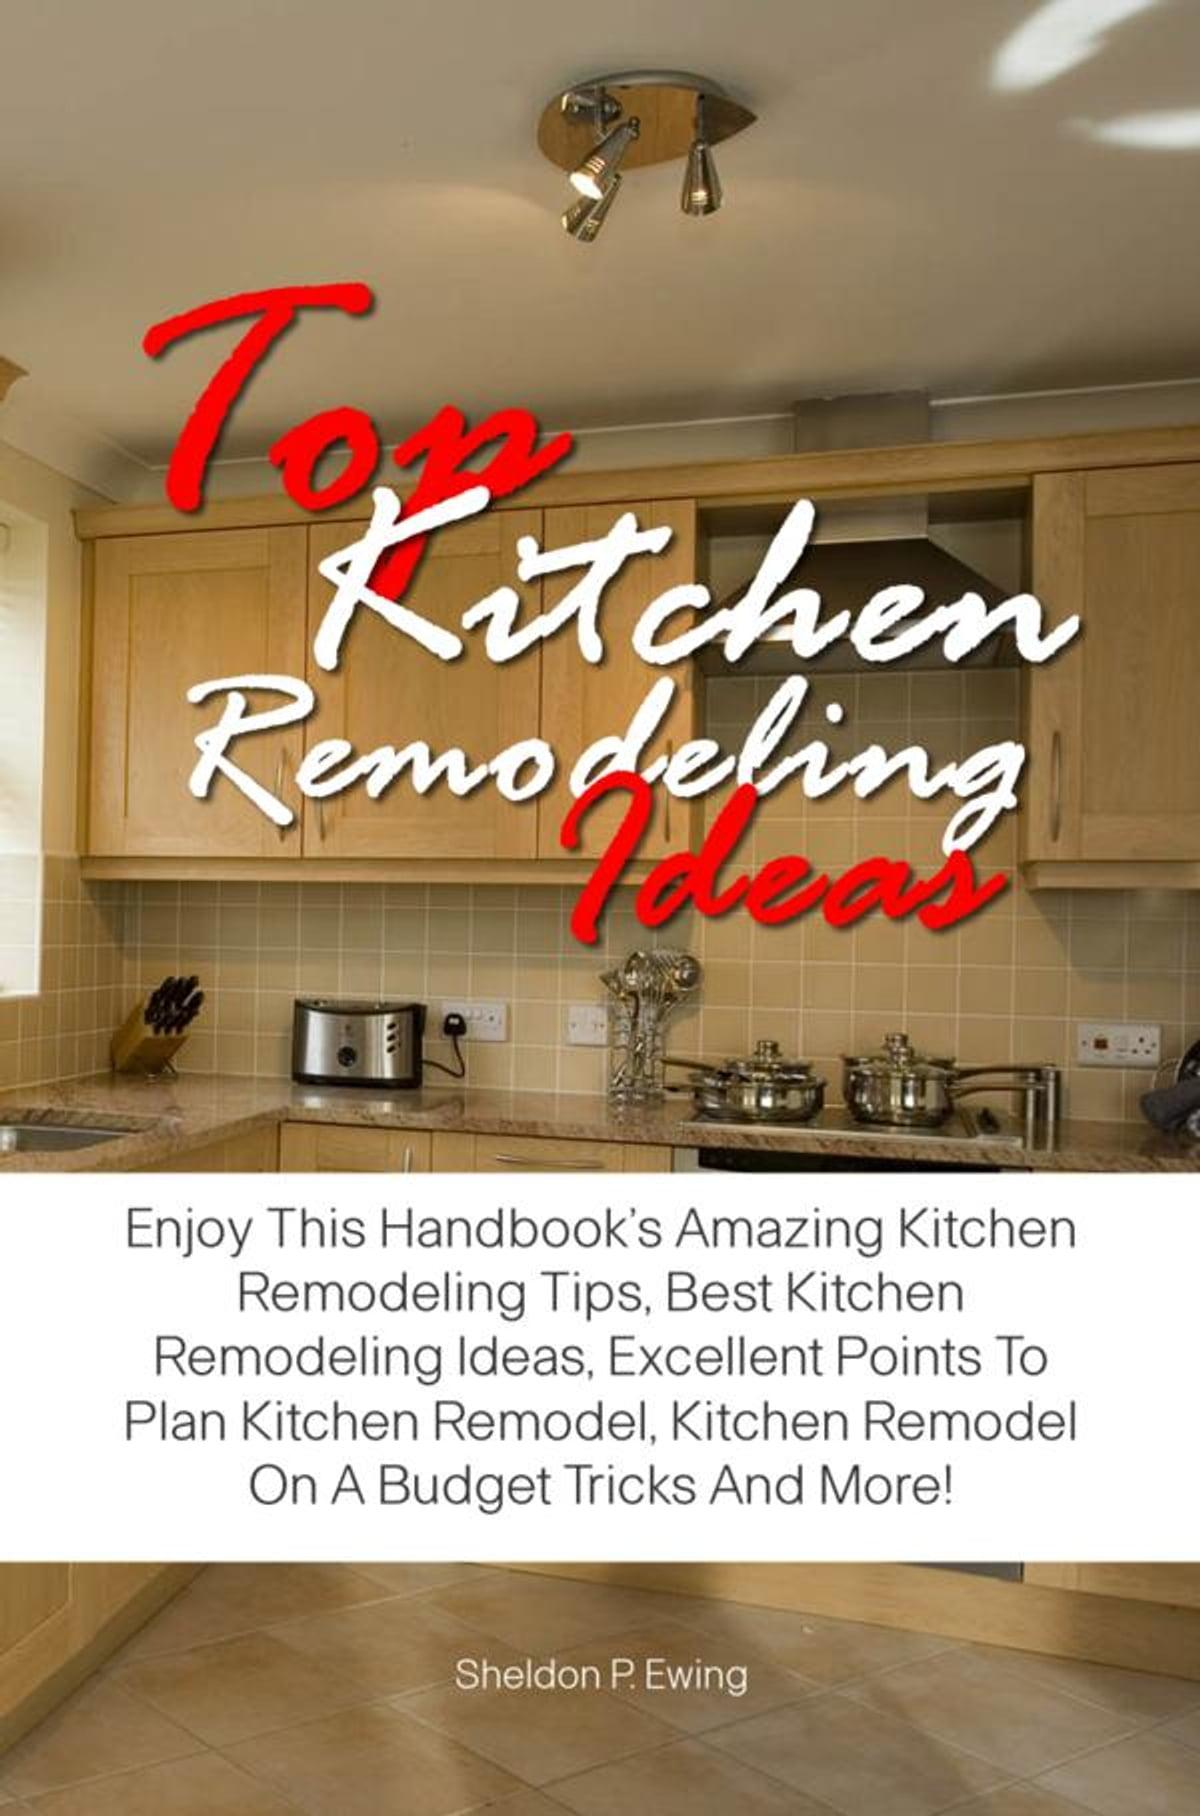 Top Kitchen Remodeling Ideas Ebook By Sheldon P Ewing Rakuten Kobo